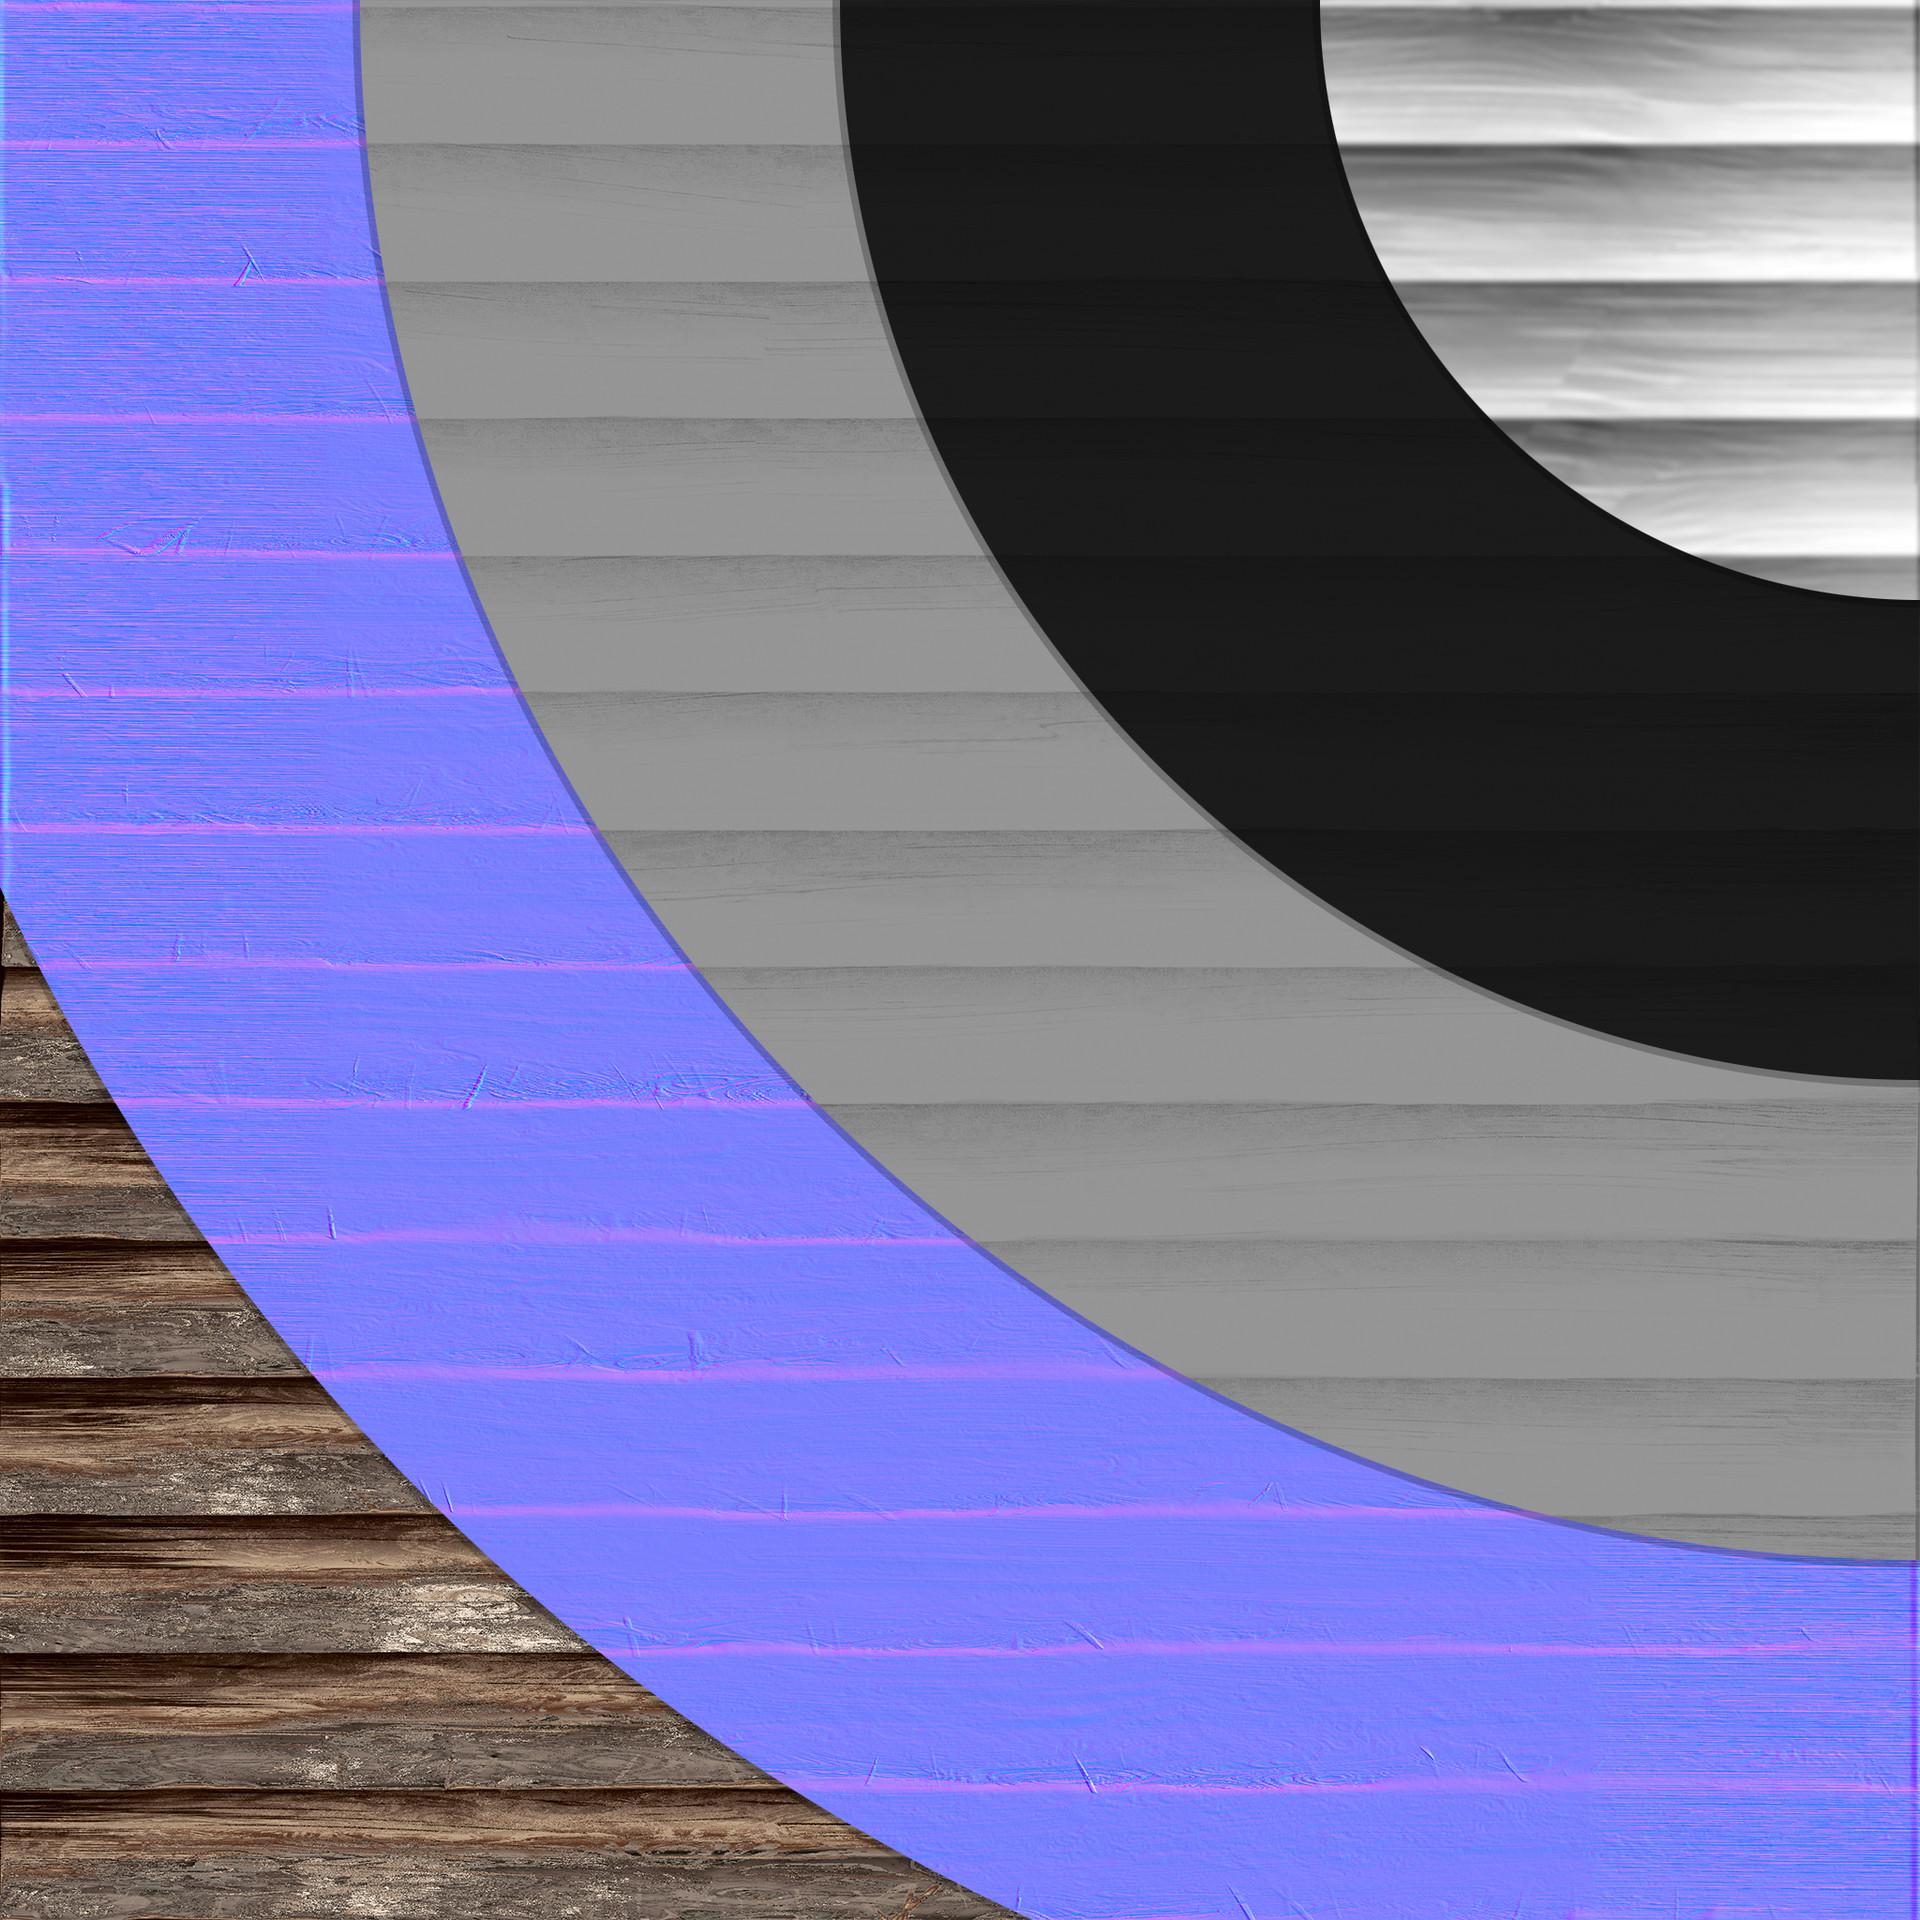 Victor santos woodenplanks textures